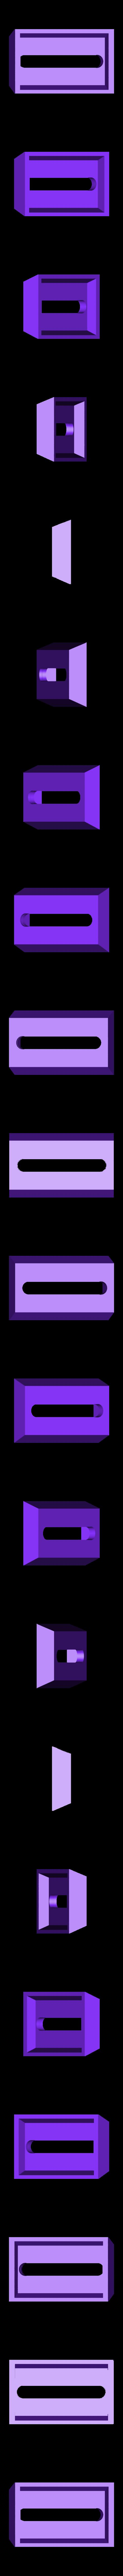 08_rail_support_apn.stl Download free STL file Photo copier slides negative super 8 • Template to 3D print, titi01